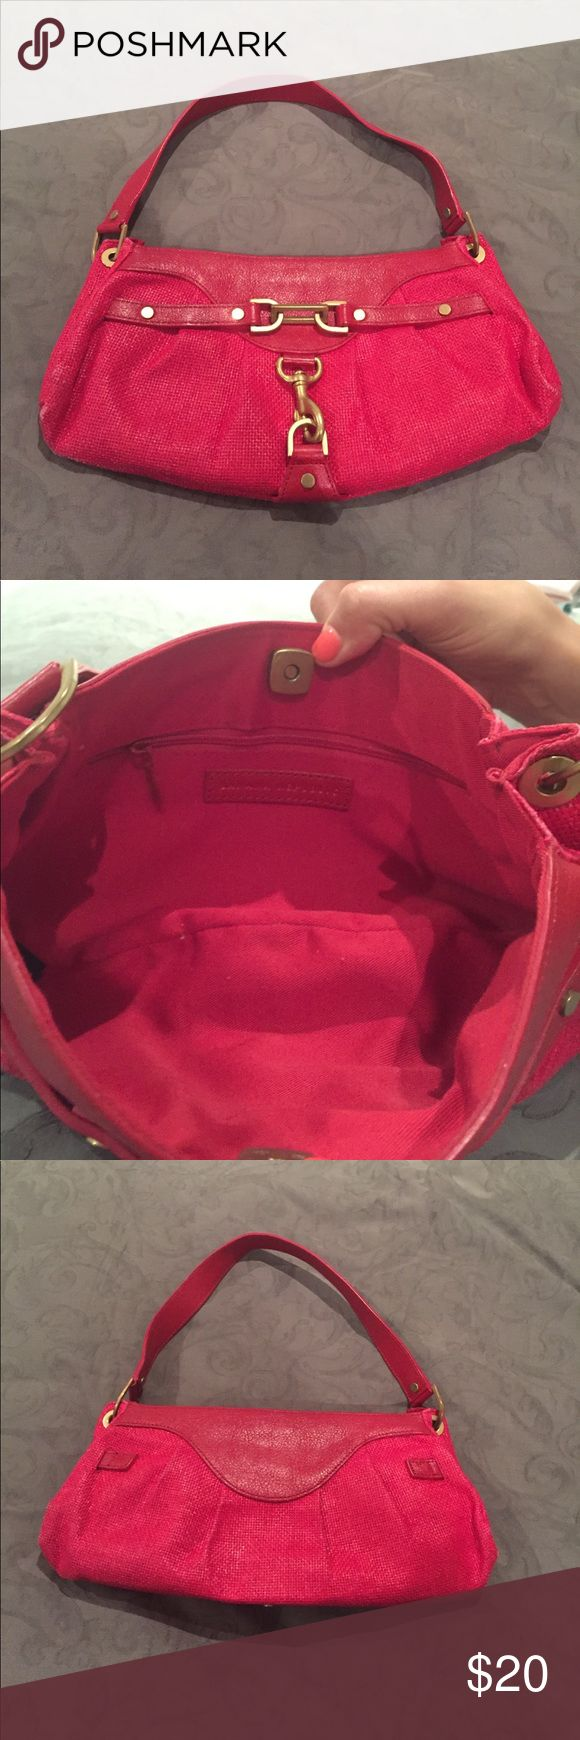 Banana Republic Red straw purse w/ gold hardware Banana Republic Red straw purse w/ gold hardware Banana Republic Bags Shoulder Bags